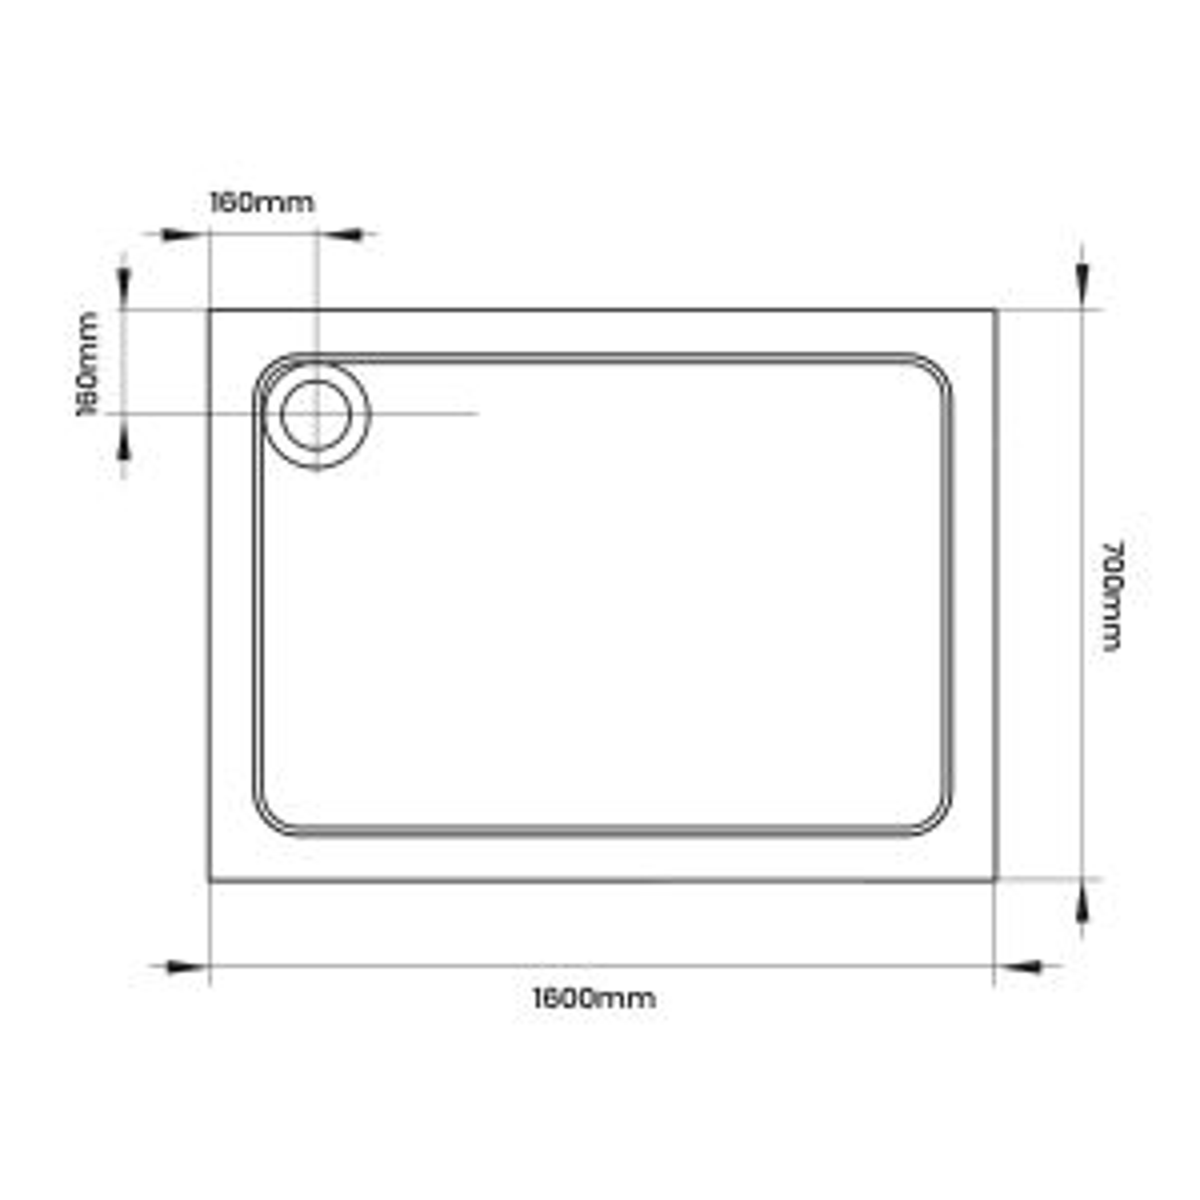 April Rectangular Anti Slip Shower Tray 1600 x 700 Line Drawing